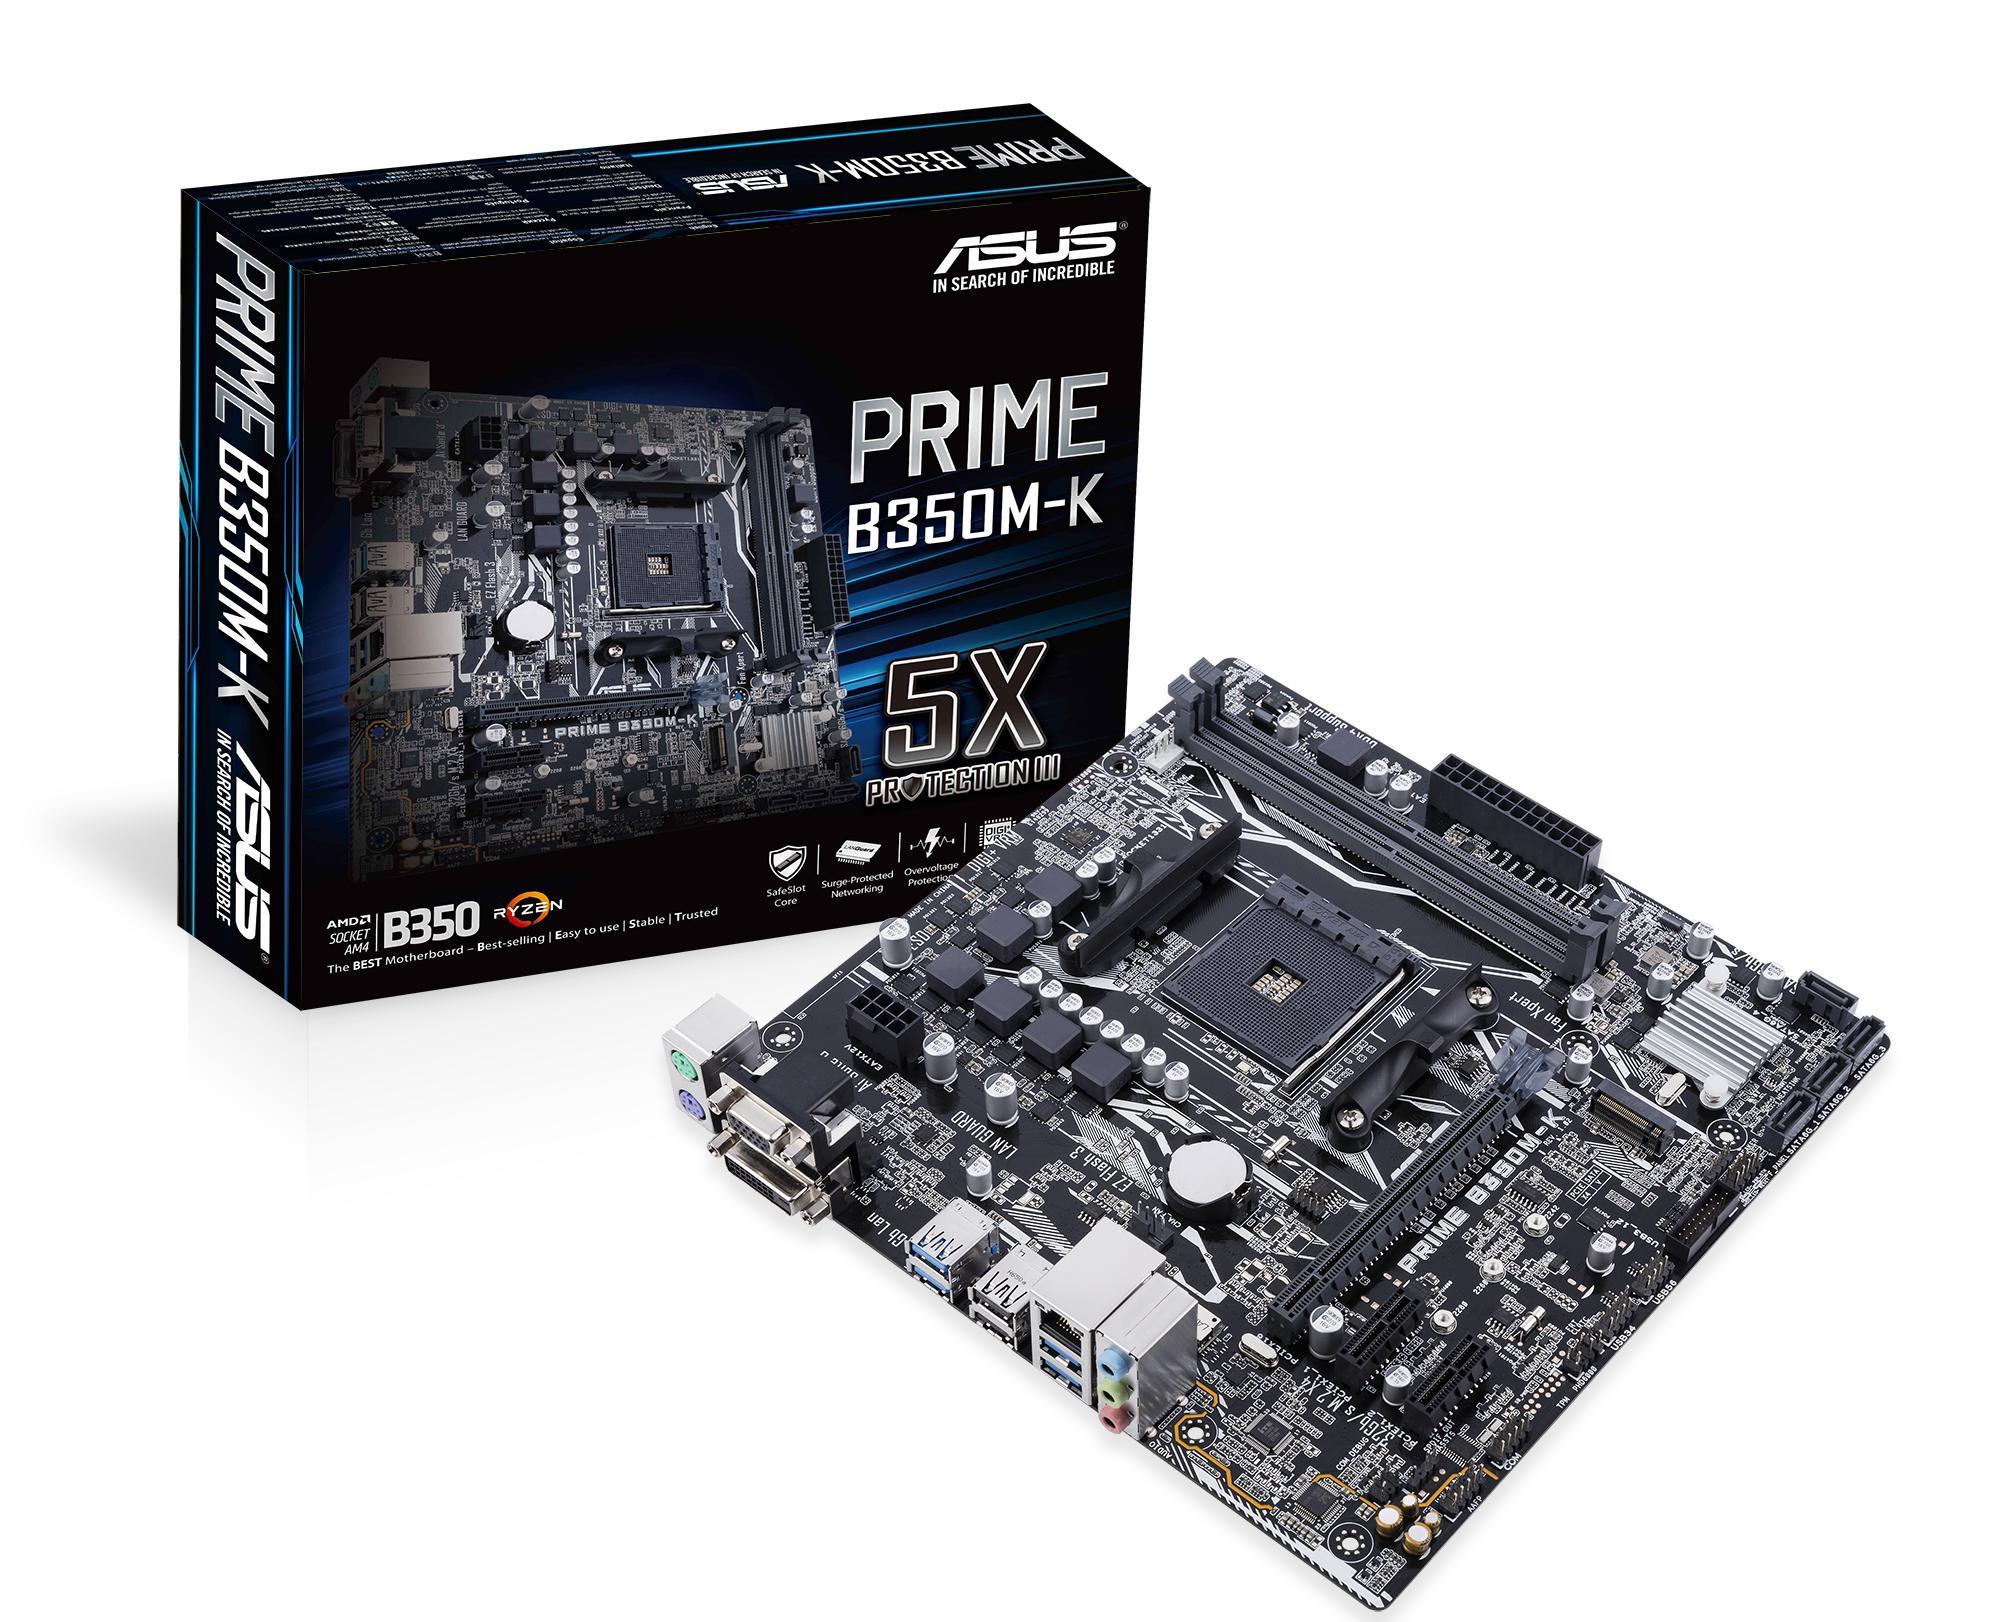 ASUS B350M-K AMD B350 Socket AM4 microATX motherboard